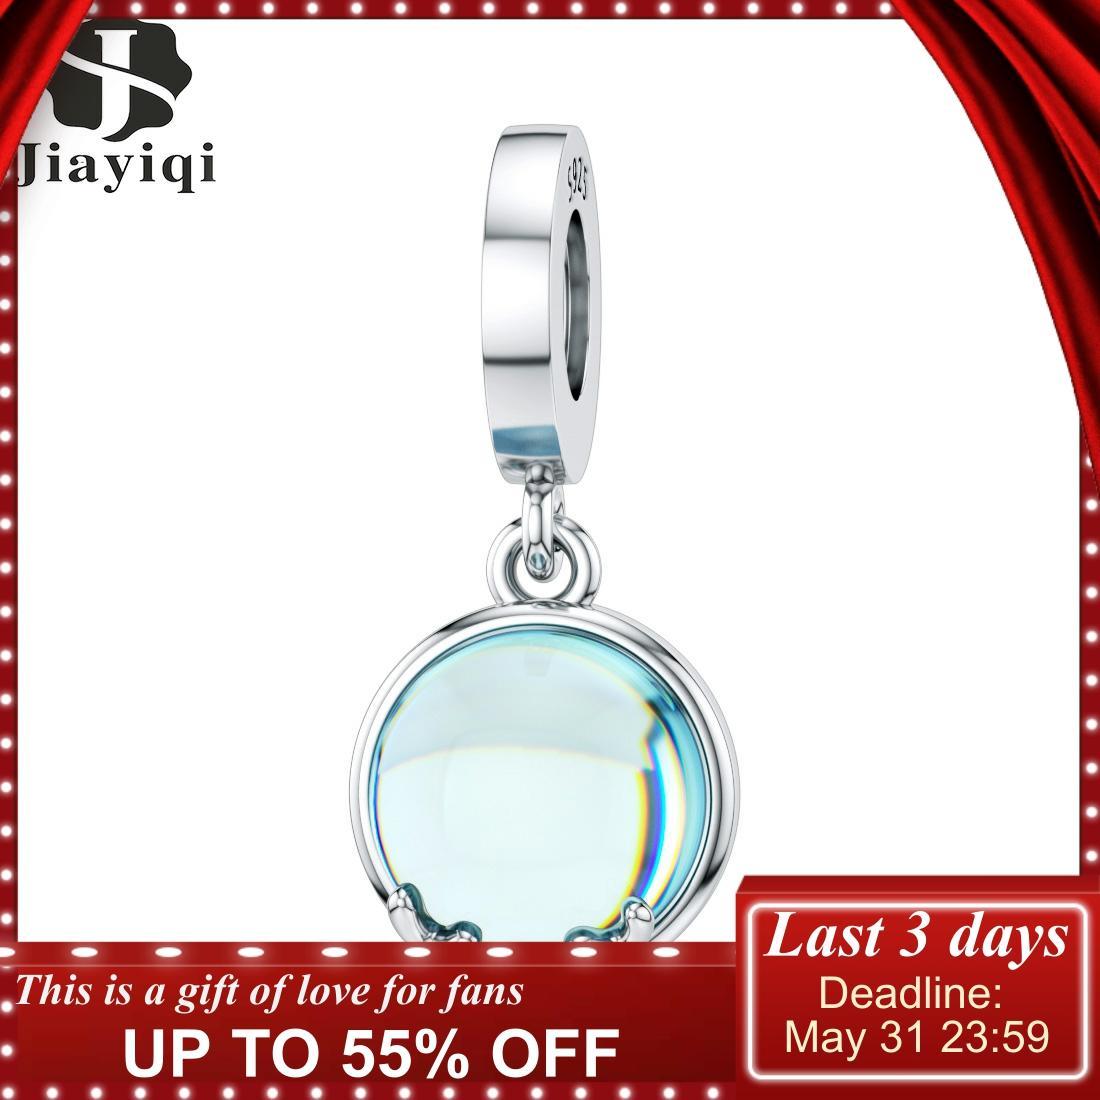 Jiayiqi 925 Sterling Silver Pendant Sky Blue Moonlight Pendant Fit Pandora Bracelet & Necklace DIY Original Female Jewelry Gifts